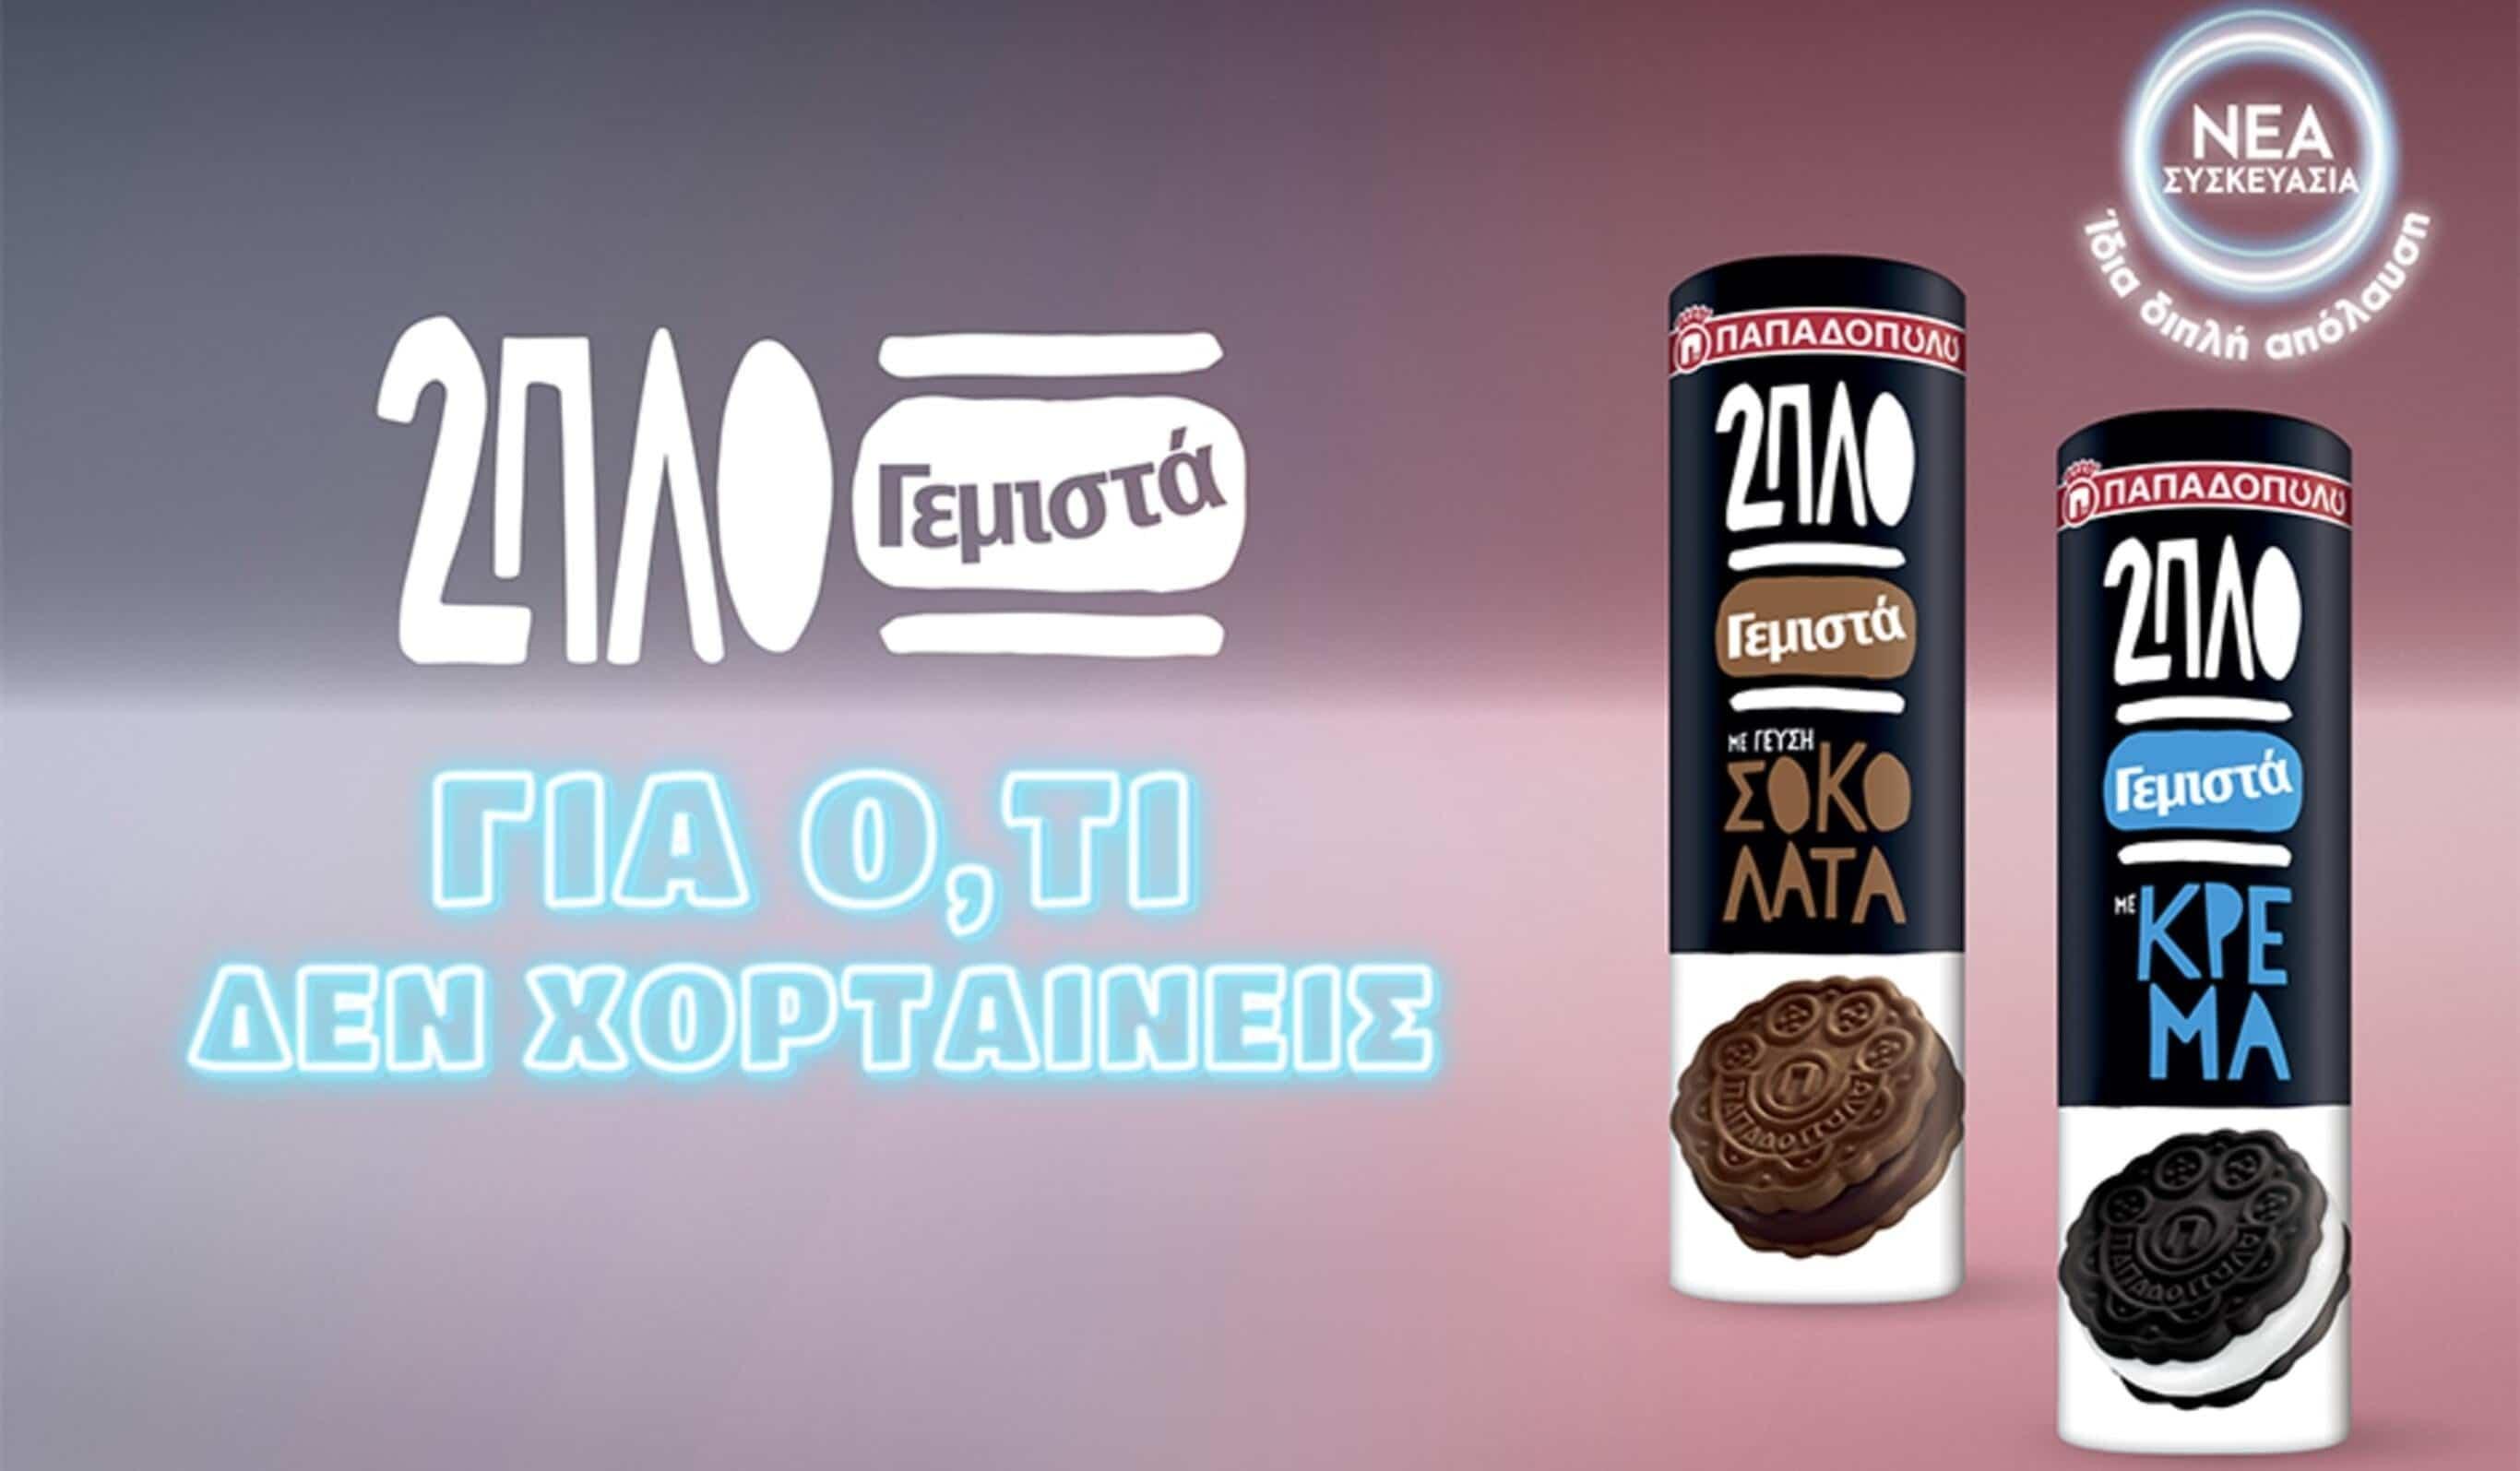 image for 2πλοΓεμιστά Παπαδοπούλου - Νέα συσκευασία, ίδια διπλή απόλαυση